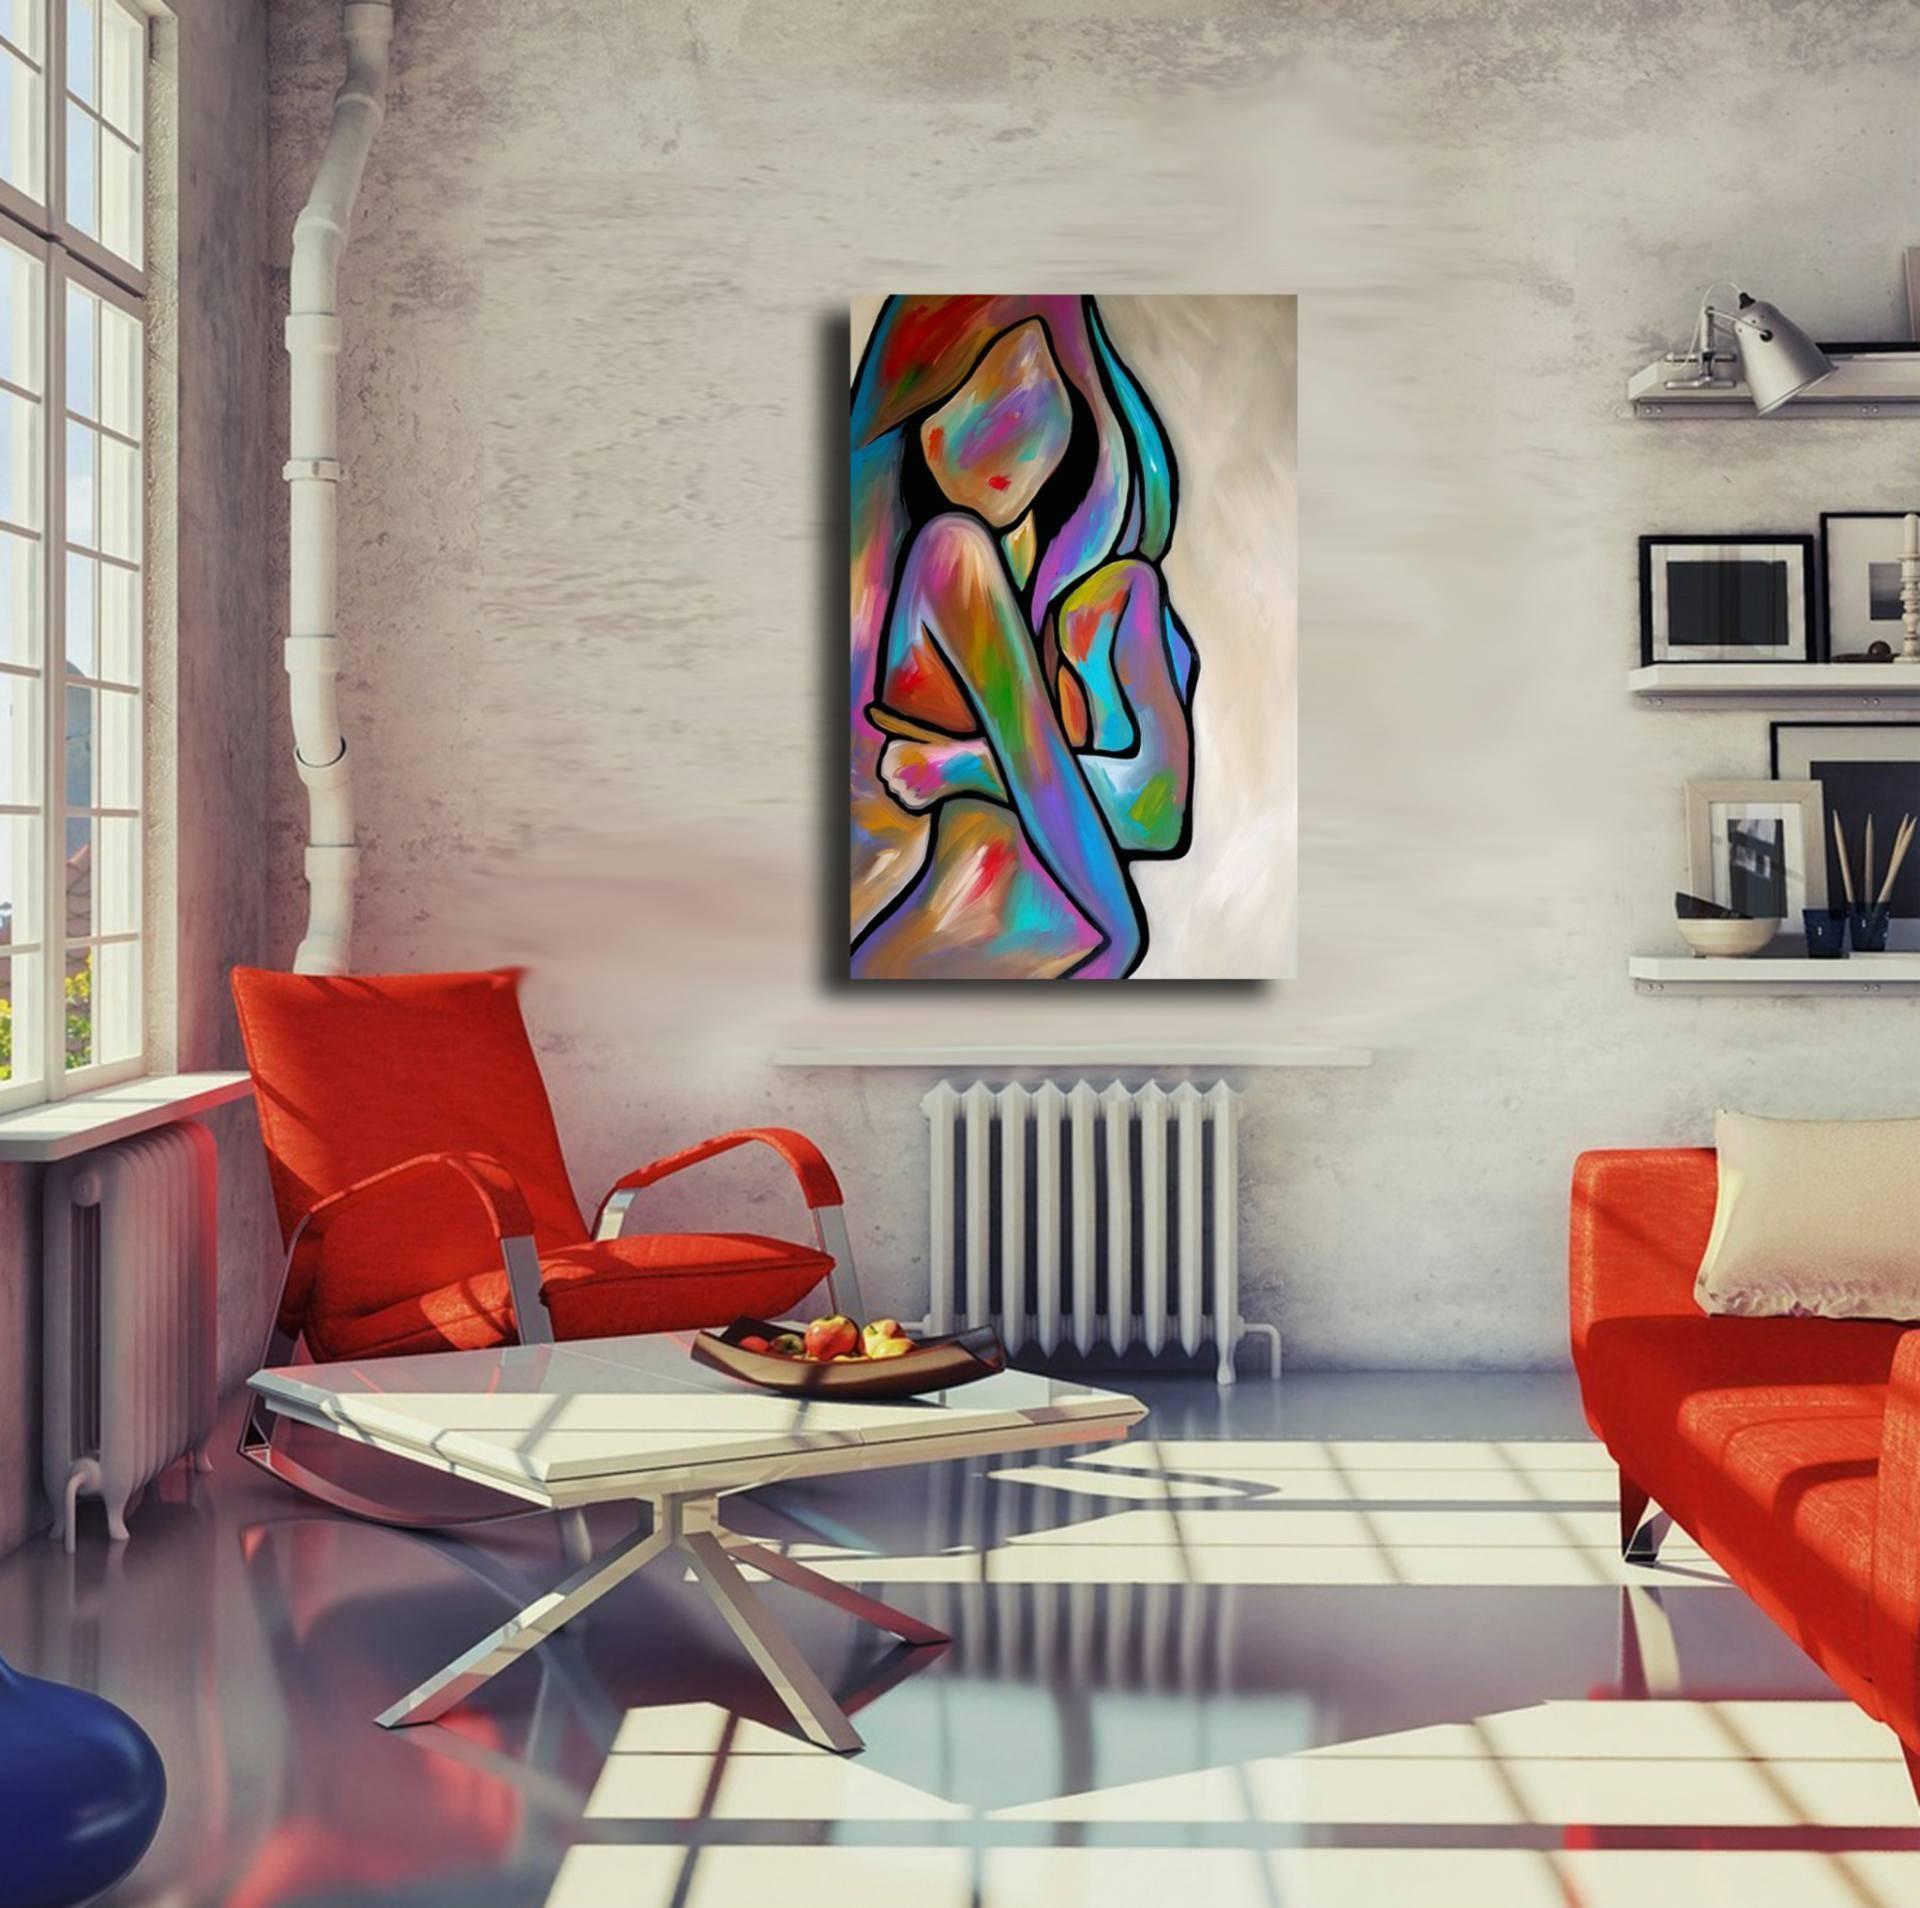 Saatchi Art: Sensual Calm Paintingthomas Fedro Throughout 2018 Sensual Wall Art (View 12 of 20)